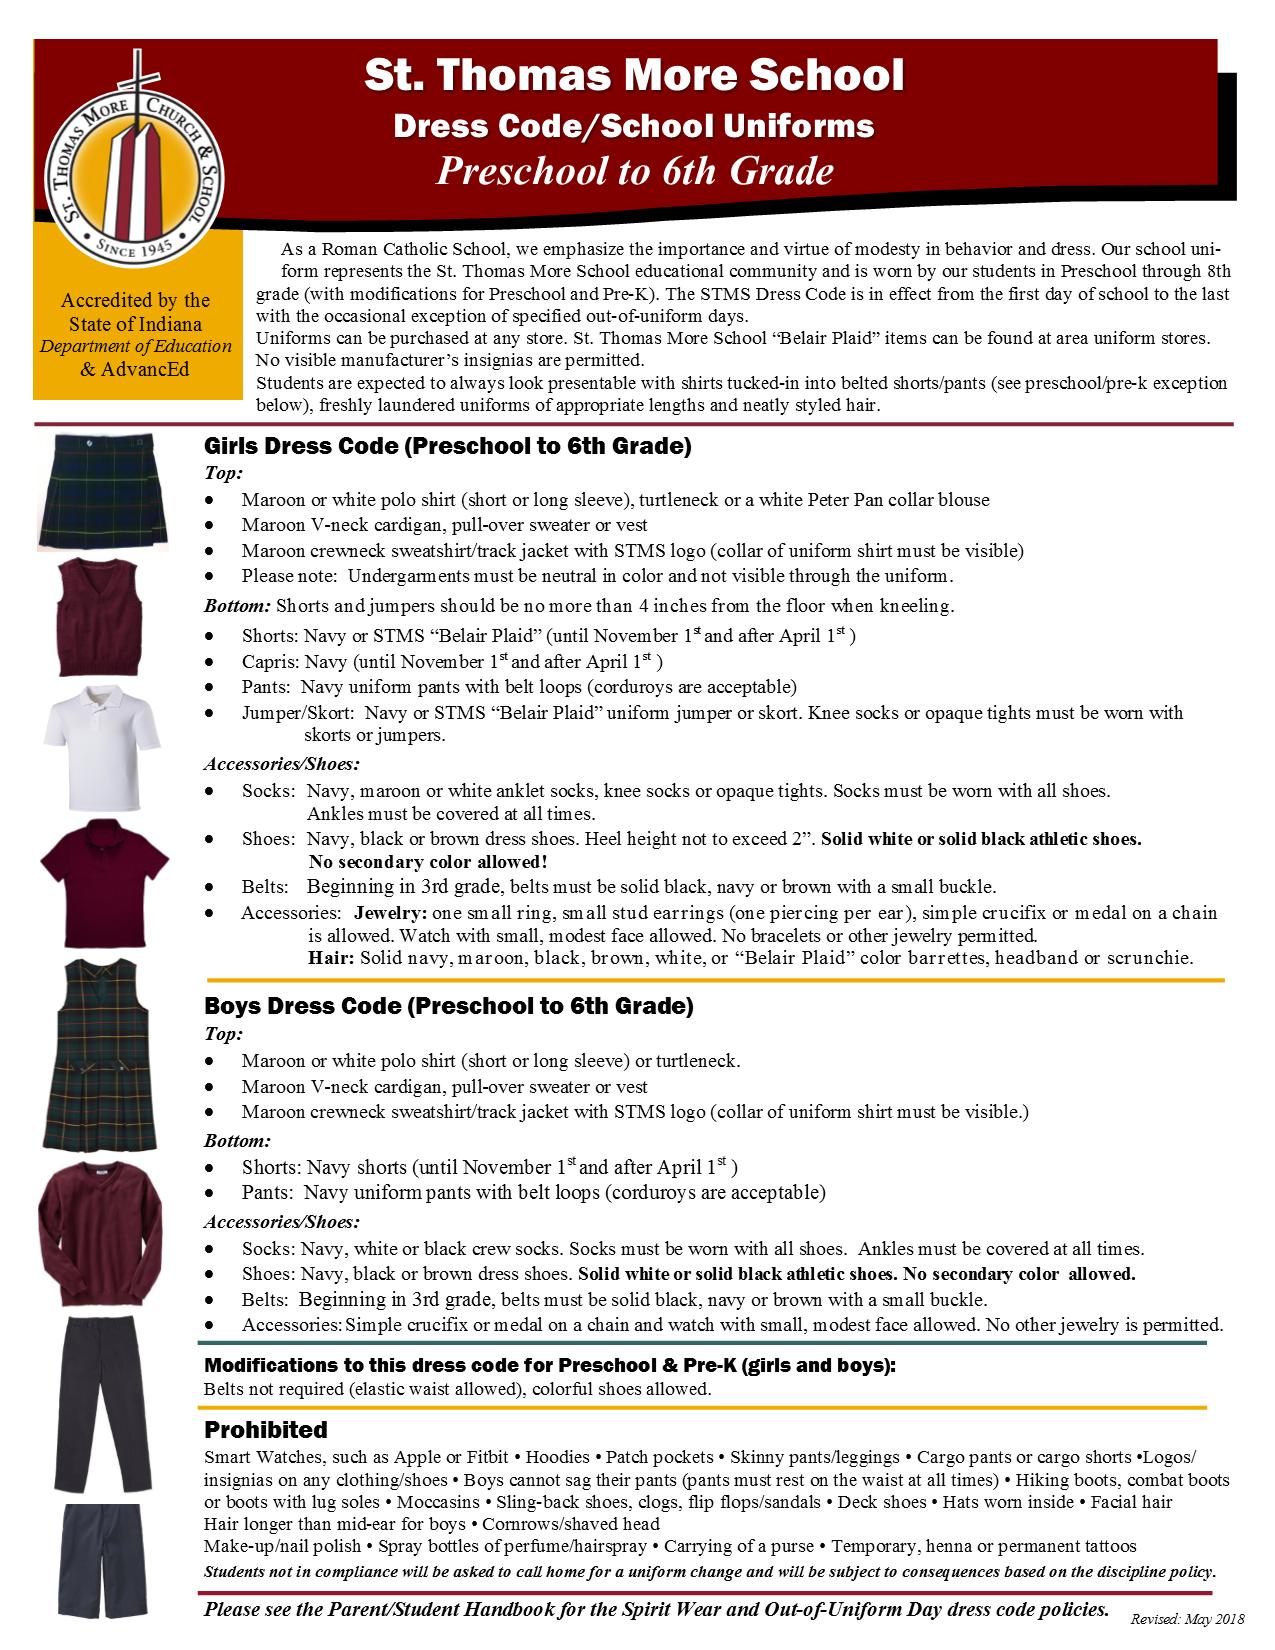 Uniform Policy Preschool thru 6th grade